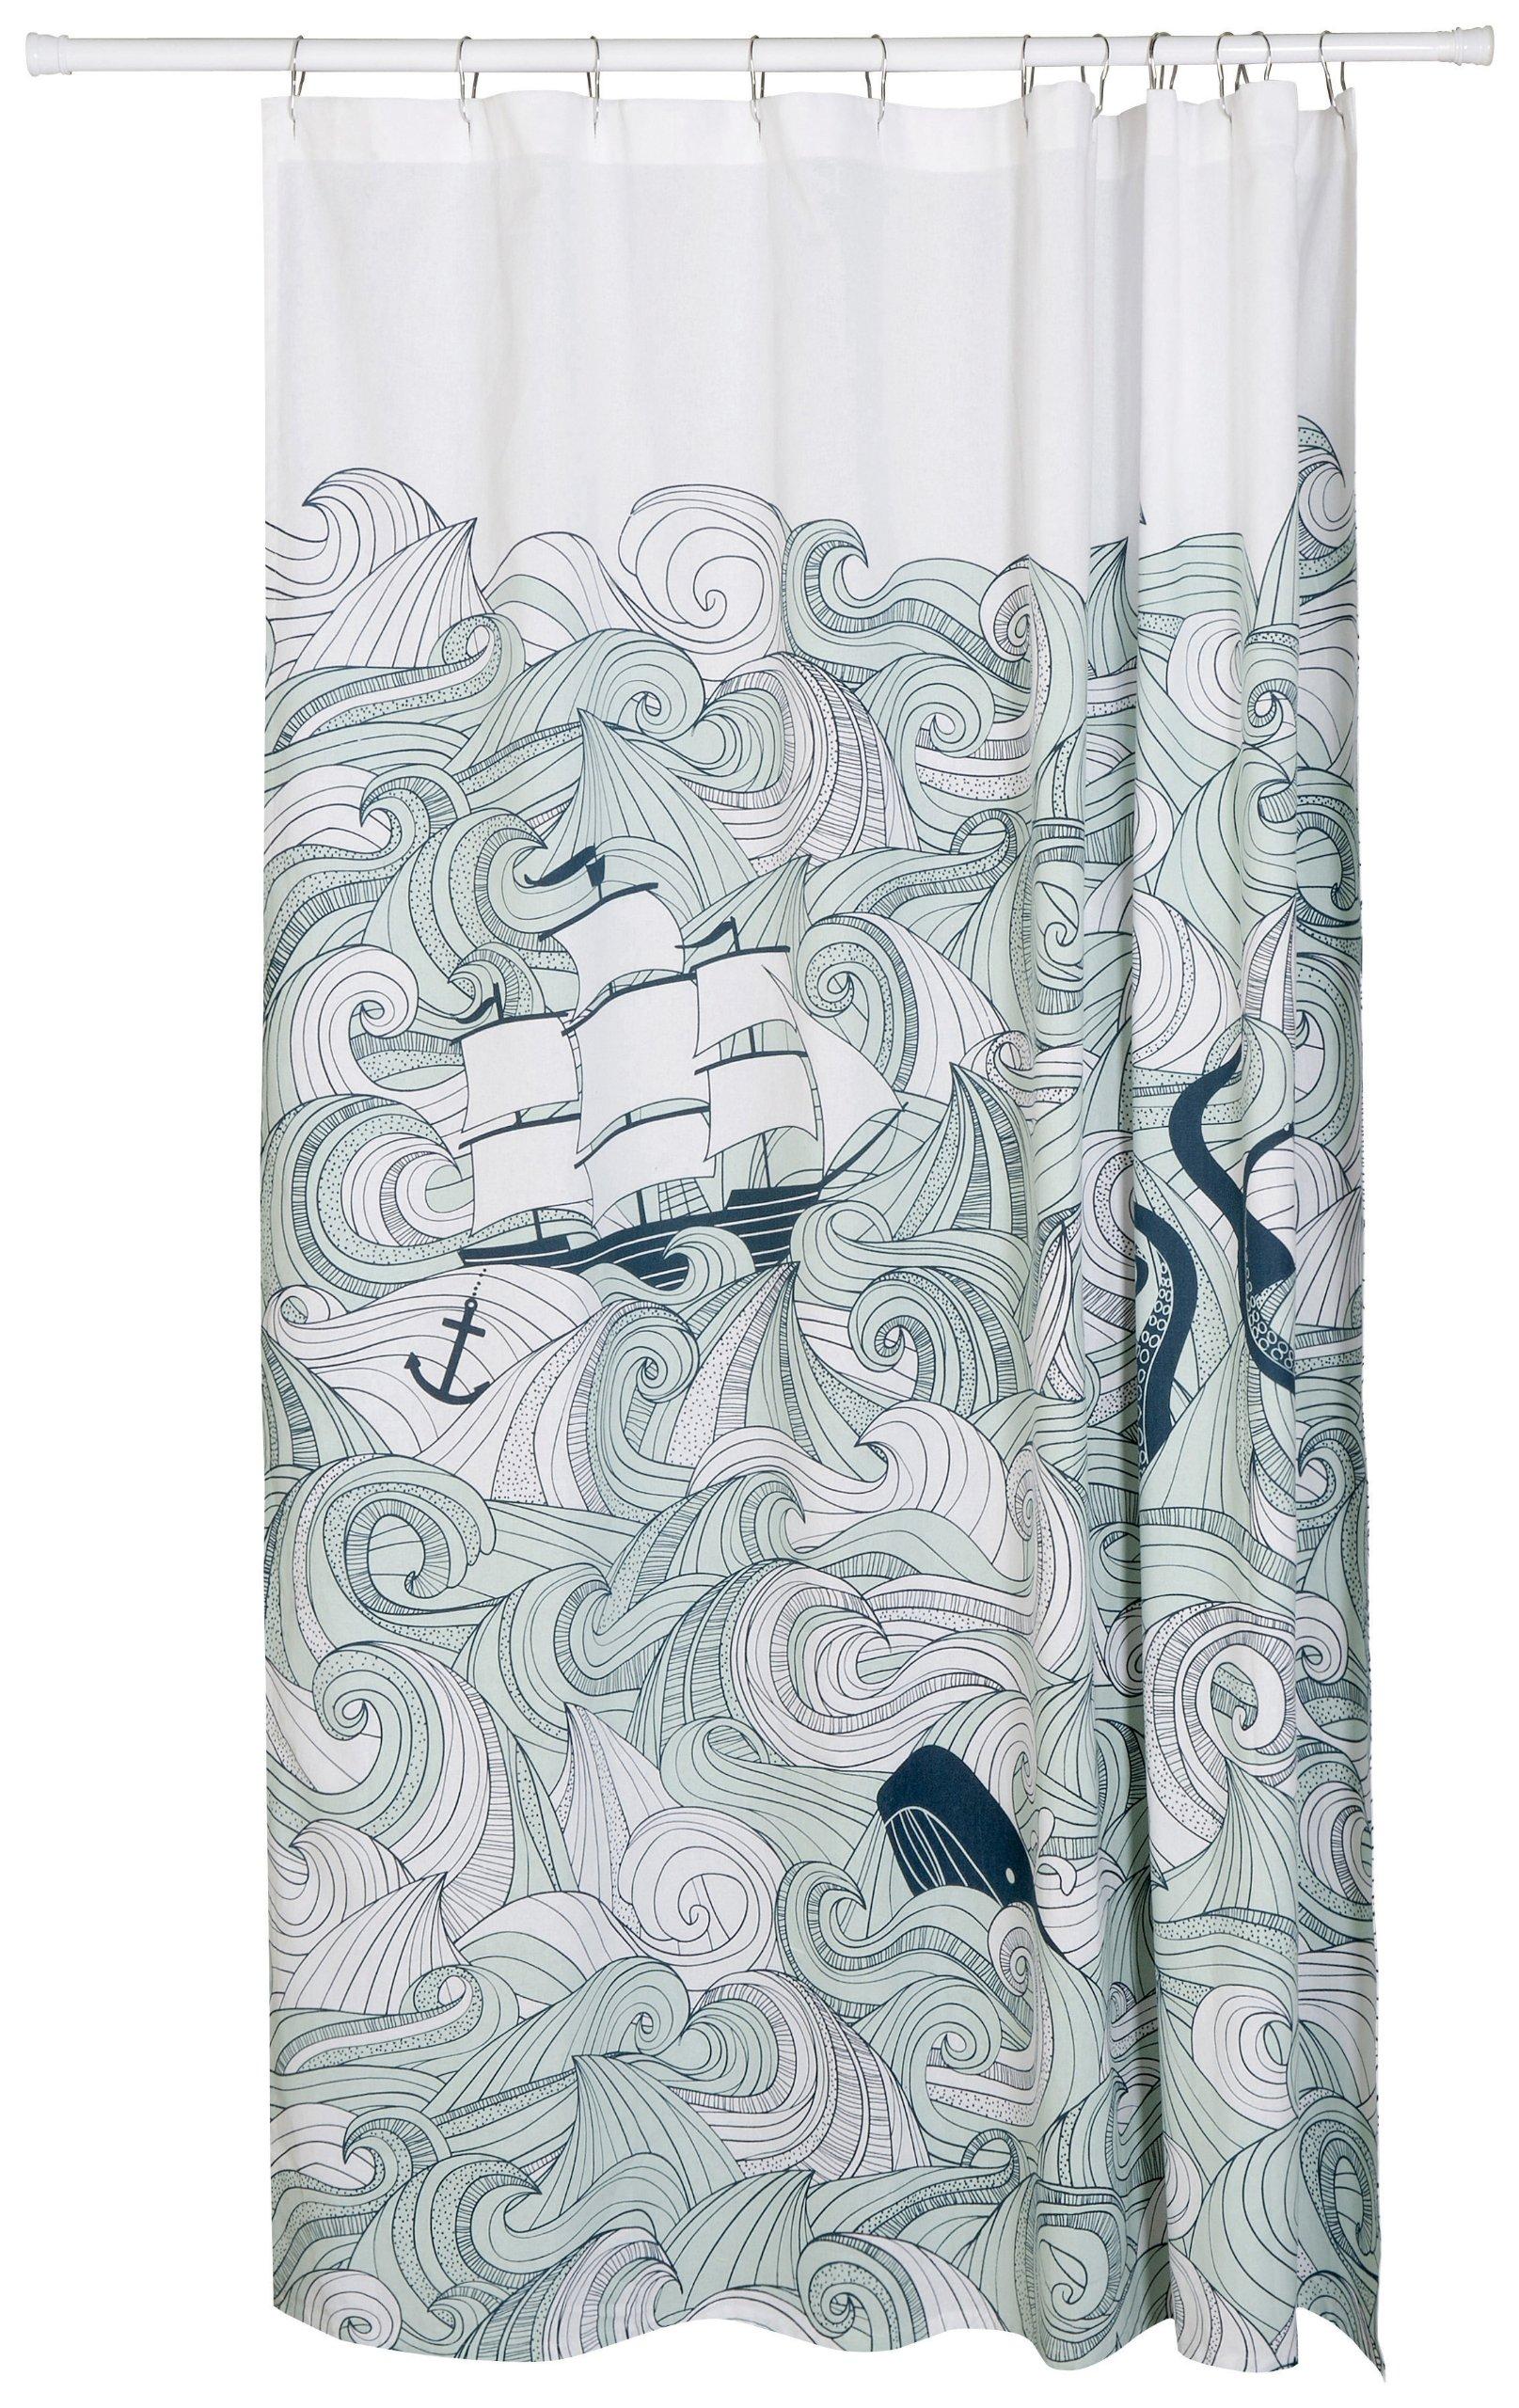 Danica Studio Cotton Shower Curtain, Odyssey Print by Now Designs